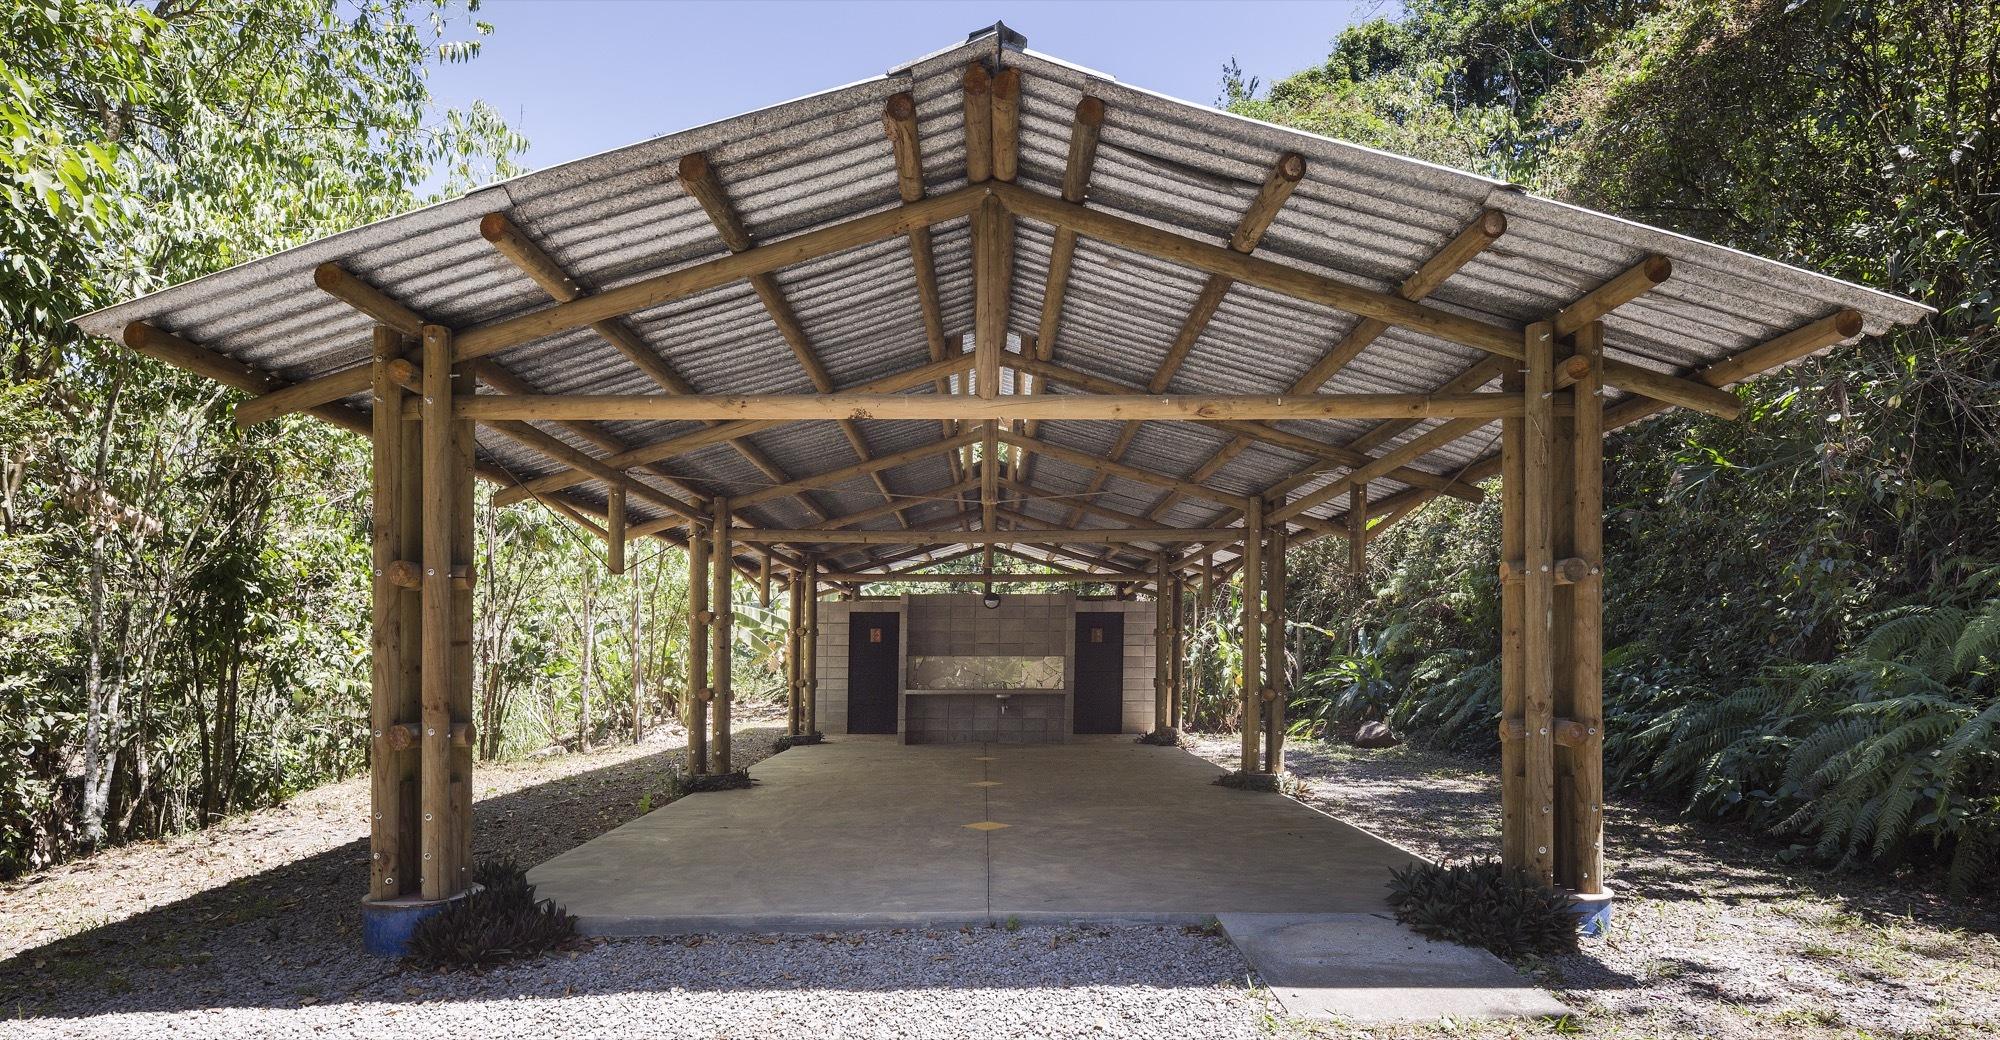 Dr. Luis Fournier Biological Reserve Welcoming Center / Fournier_Rojas Arquitectos